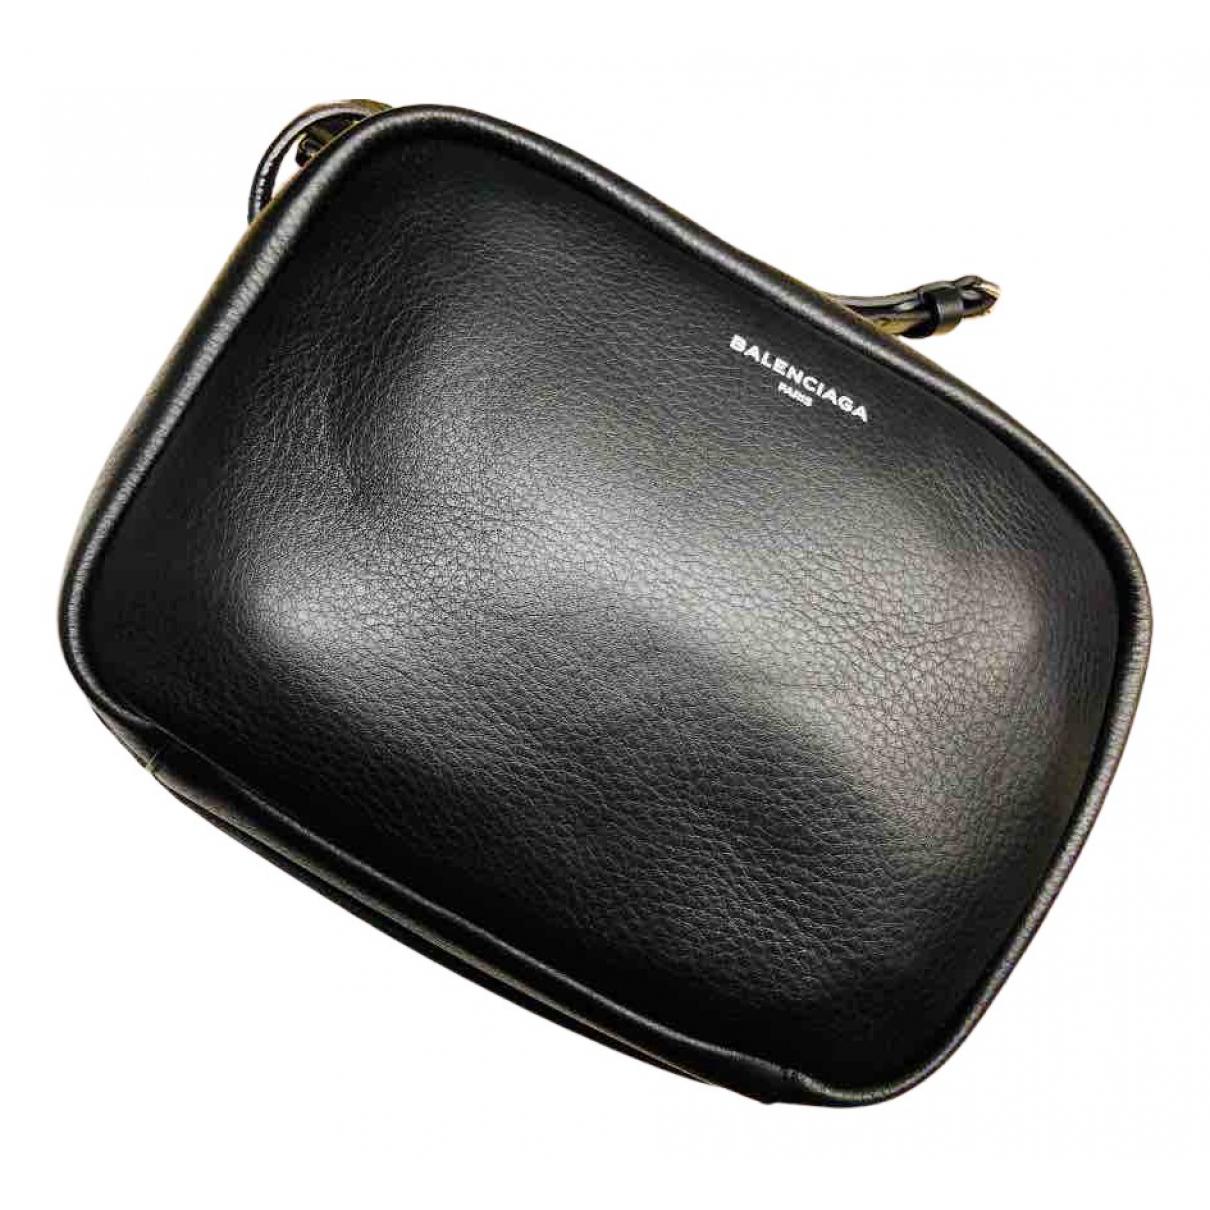 Balenciaga Everyday Handtasche in  Schwarz Leder